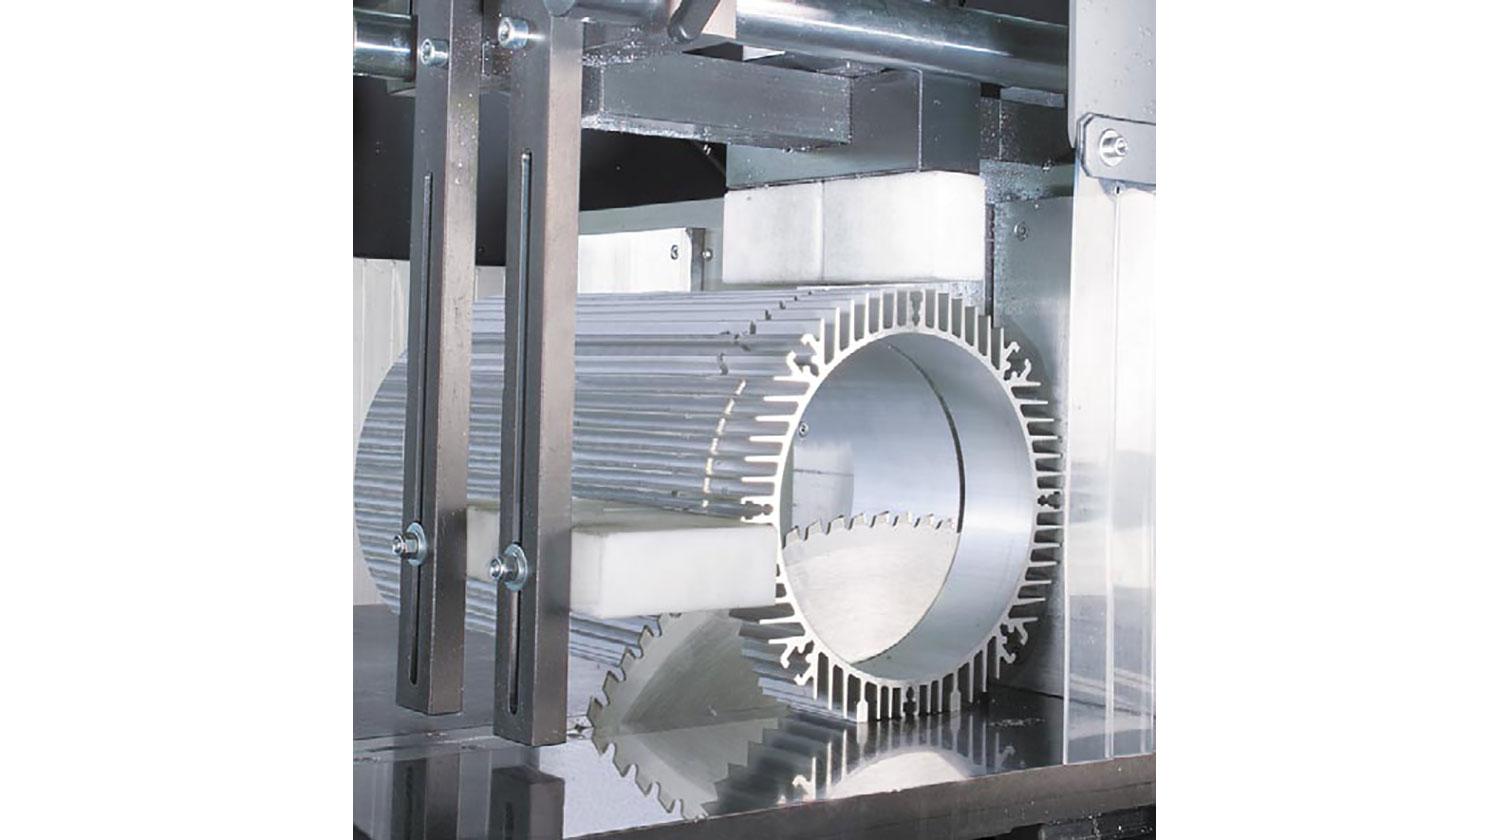 INT aluminum up cut saw Pressta Eisele GS 700 saw blade 2